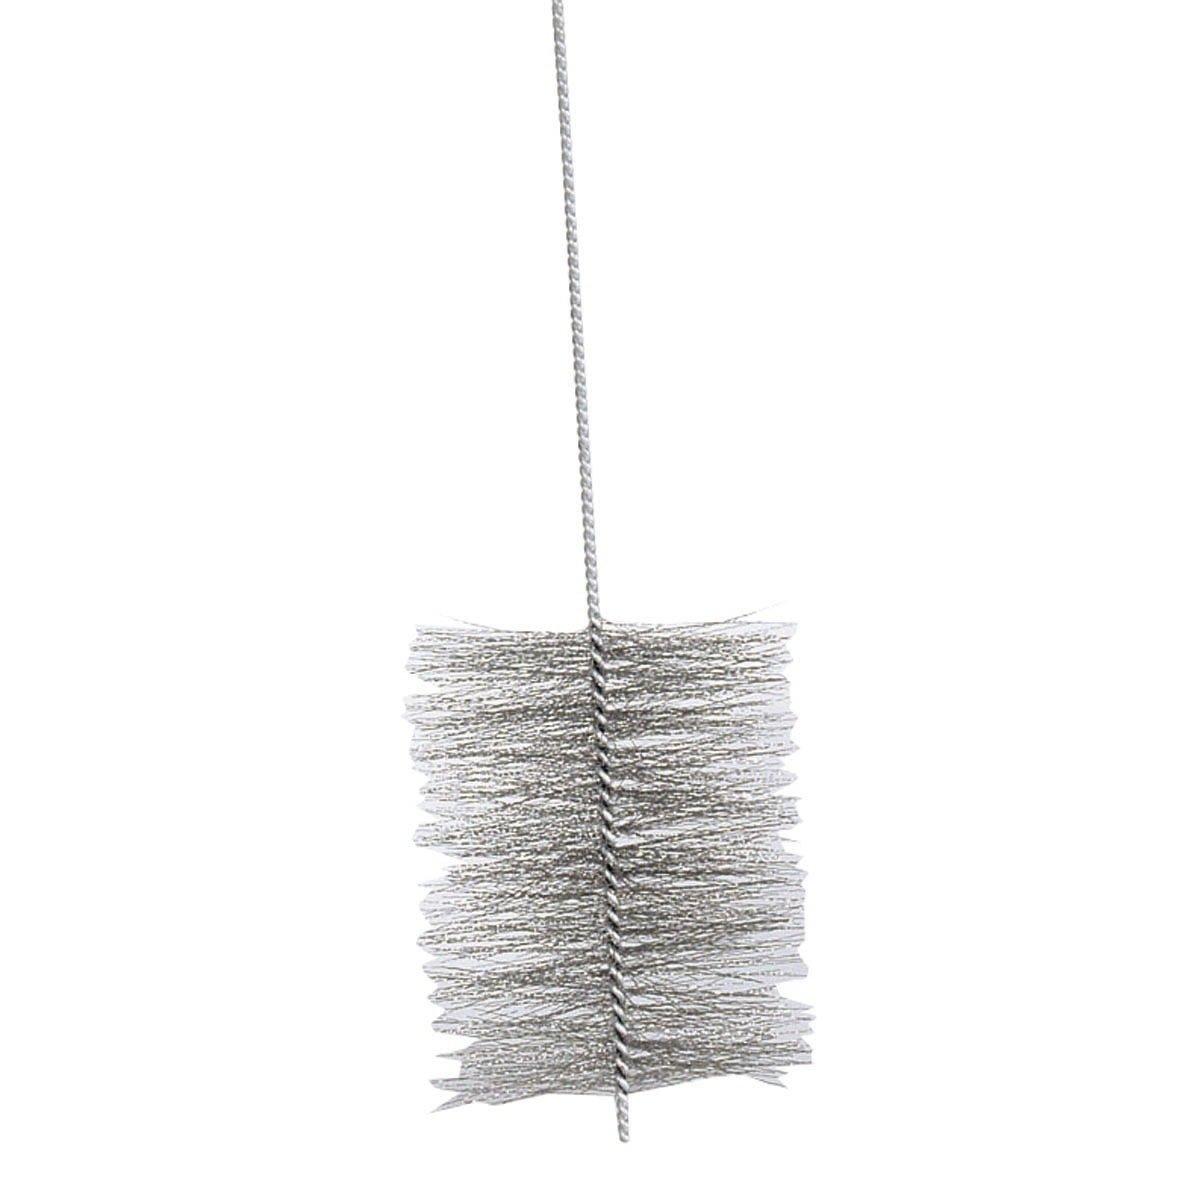 Kamino - Flam - Cepillo deshollinador para limpiar estufas, hornos de leña, chimeneas, tubos de chimeneas (150 cm, Ø 180 mm) - acero - plata: Amazon.es: ...